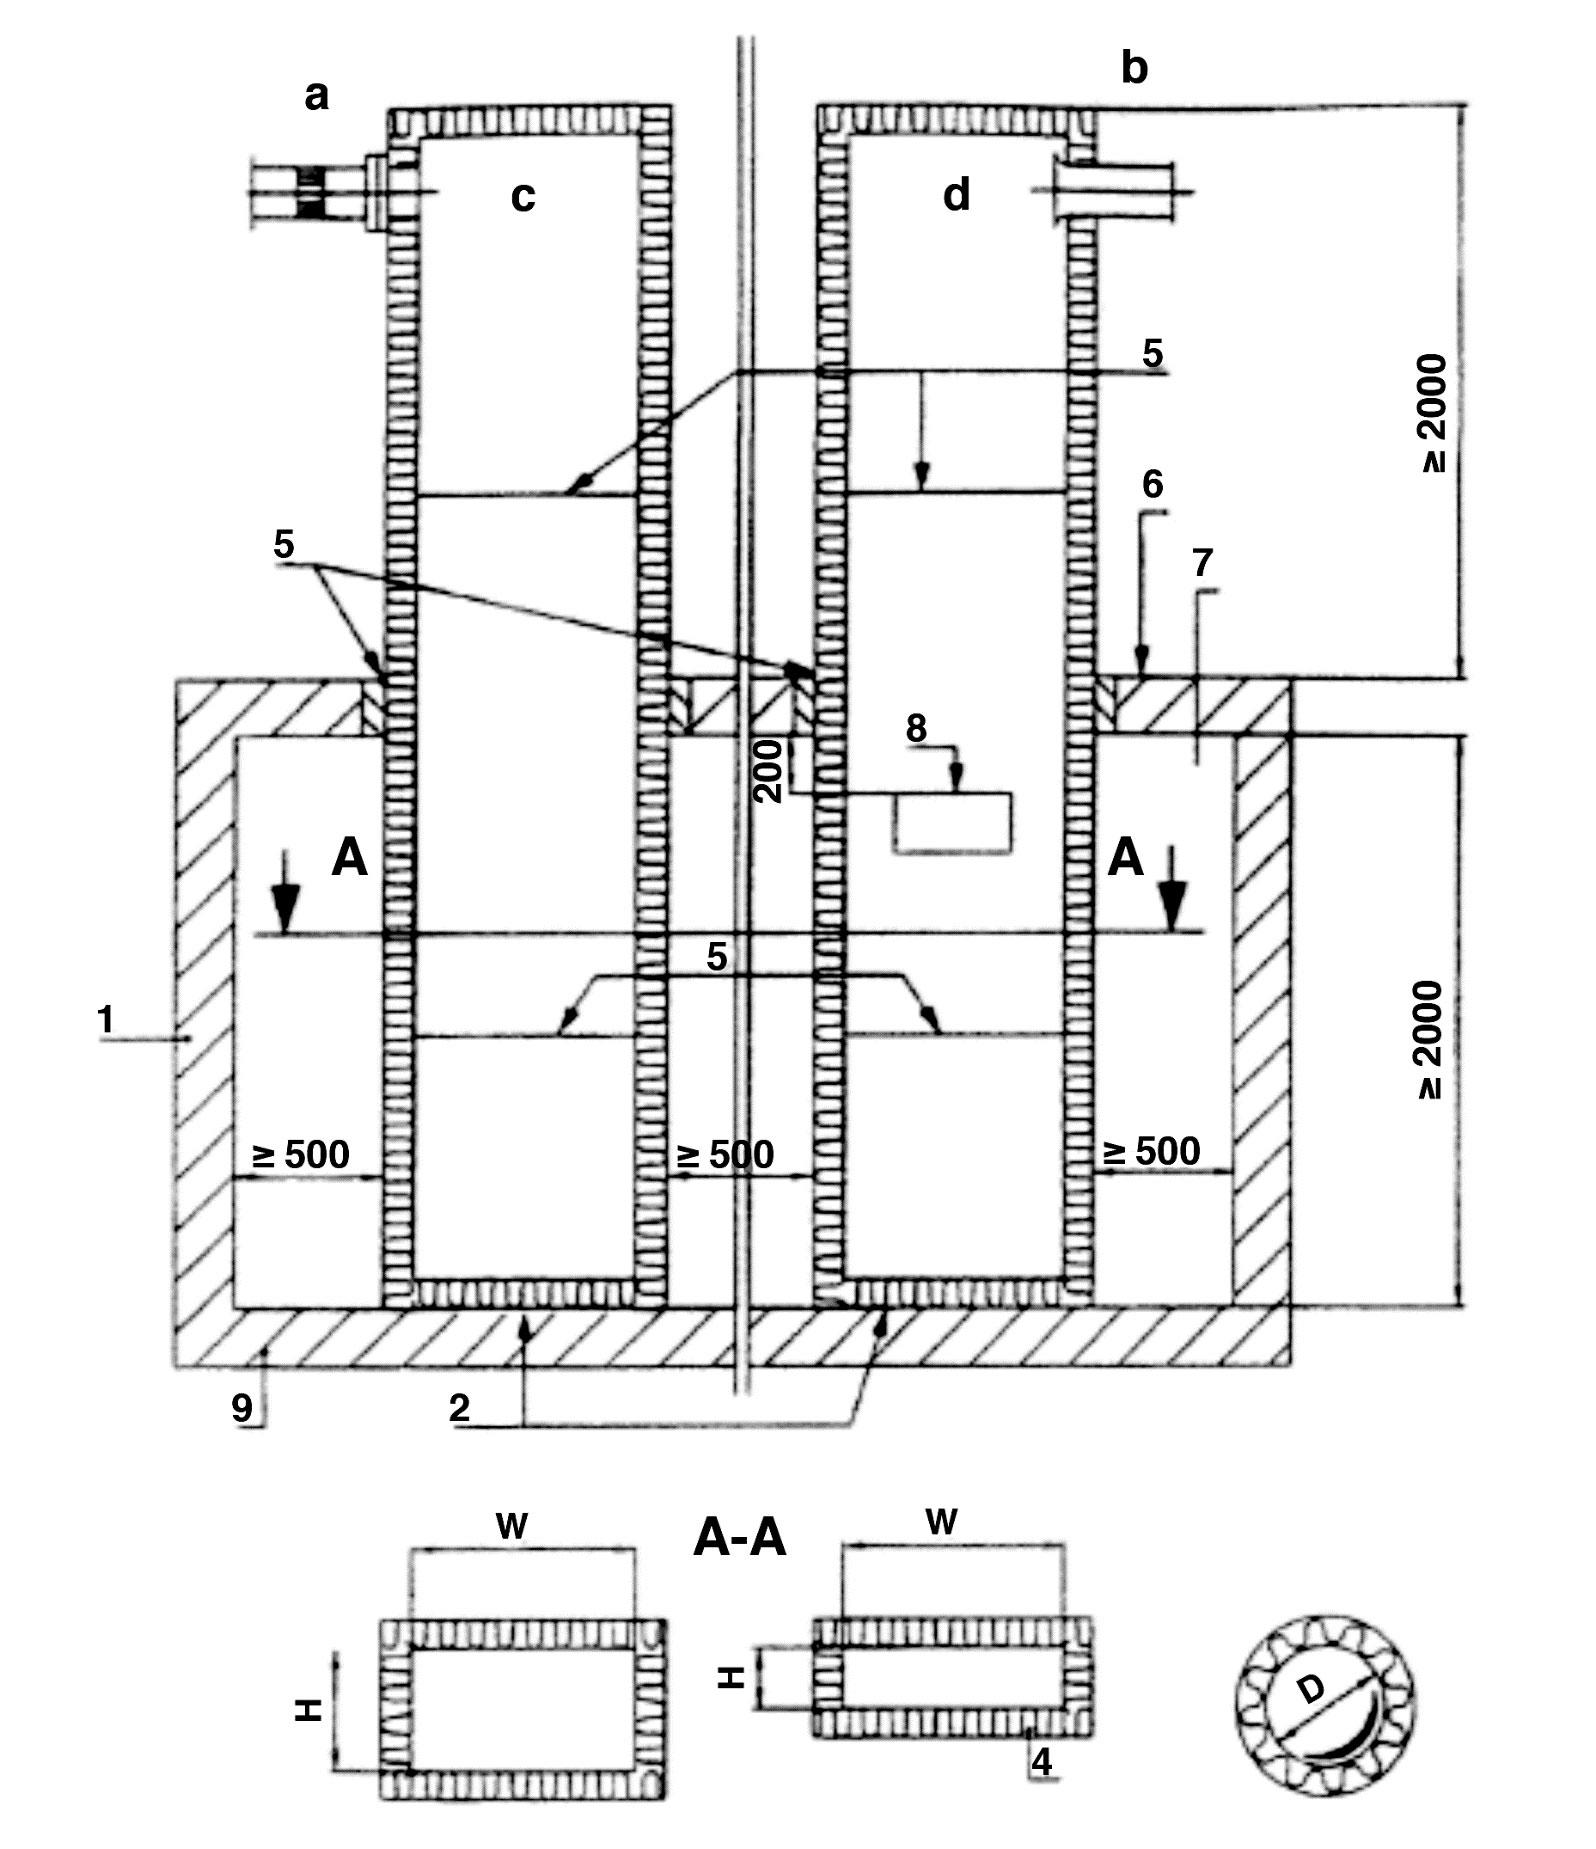 PBM Group-Produktgebäudeleitungs-Betonschema